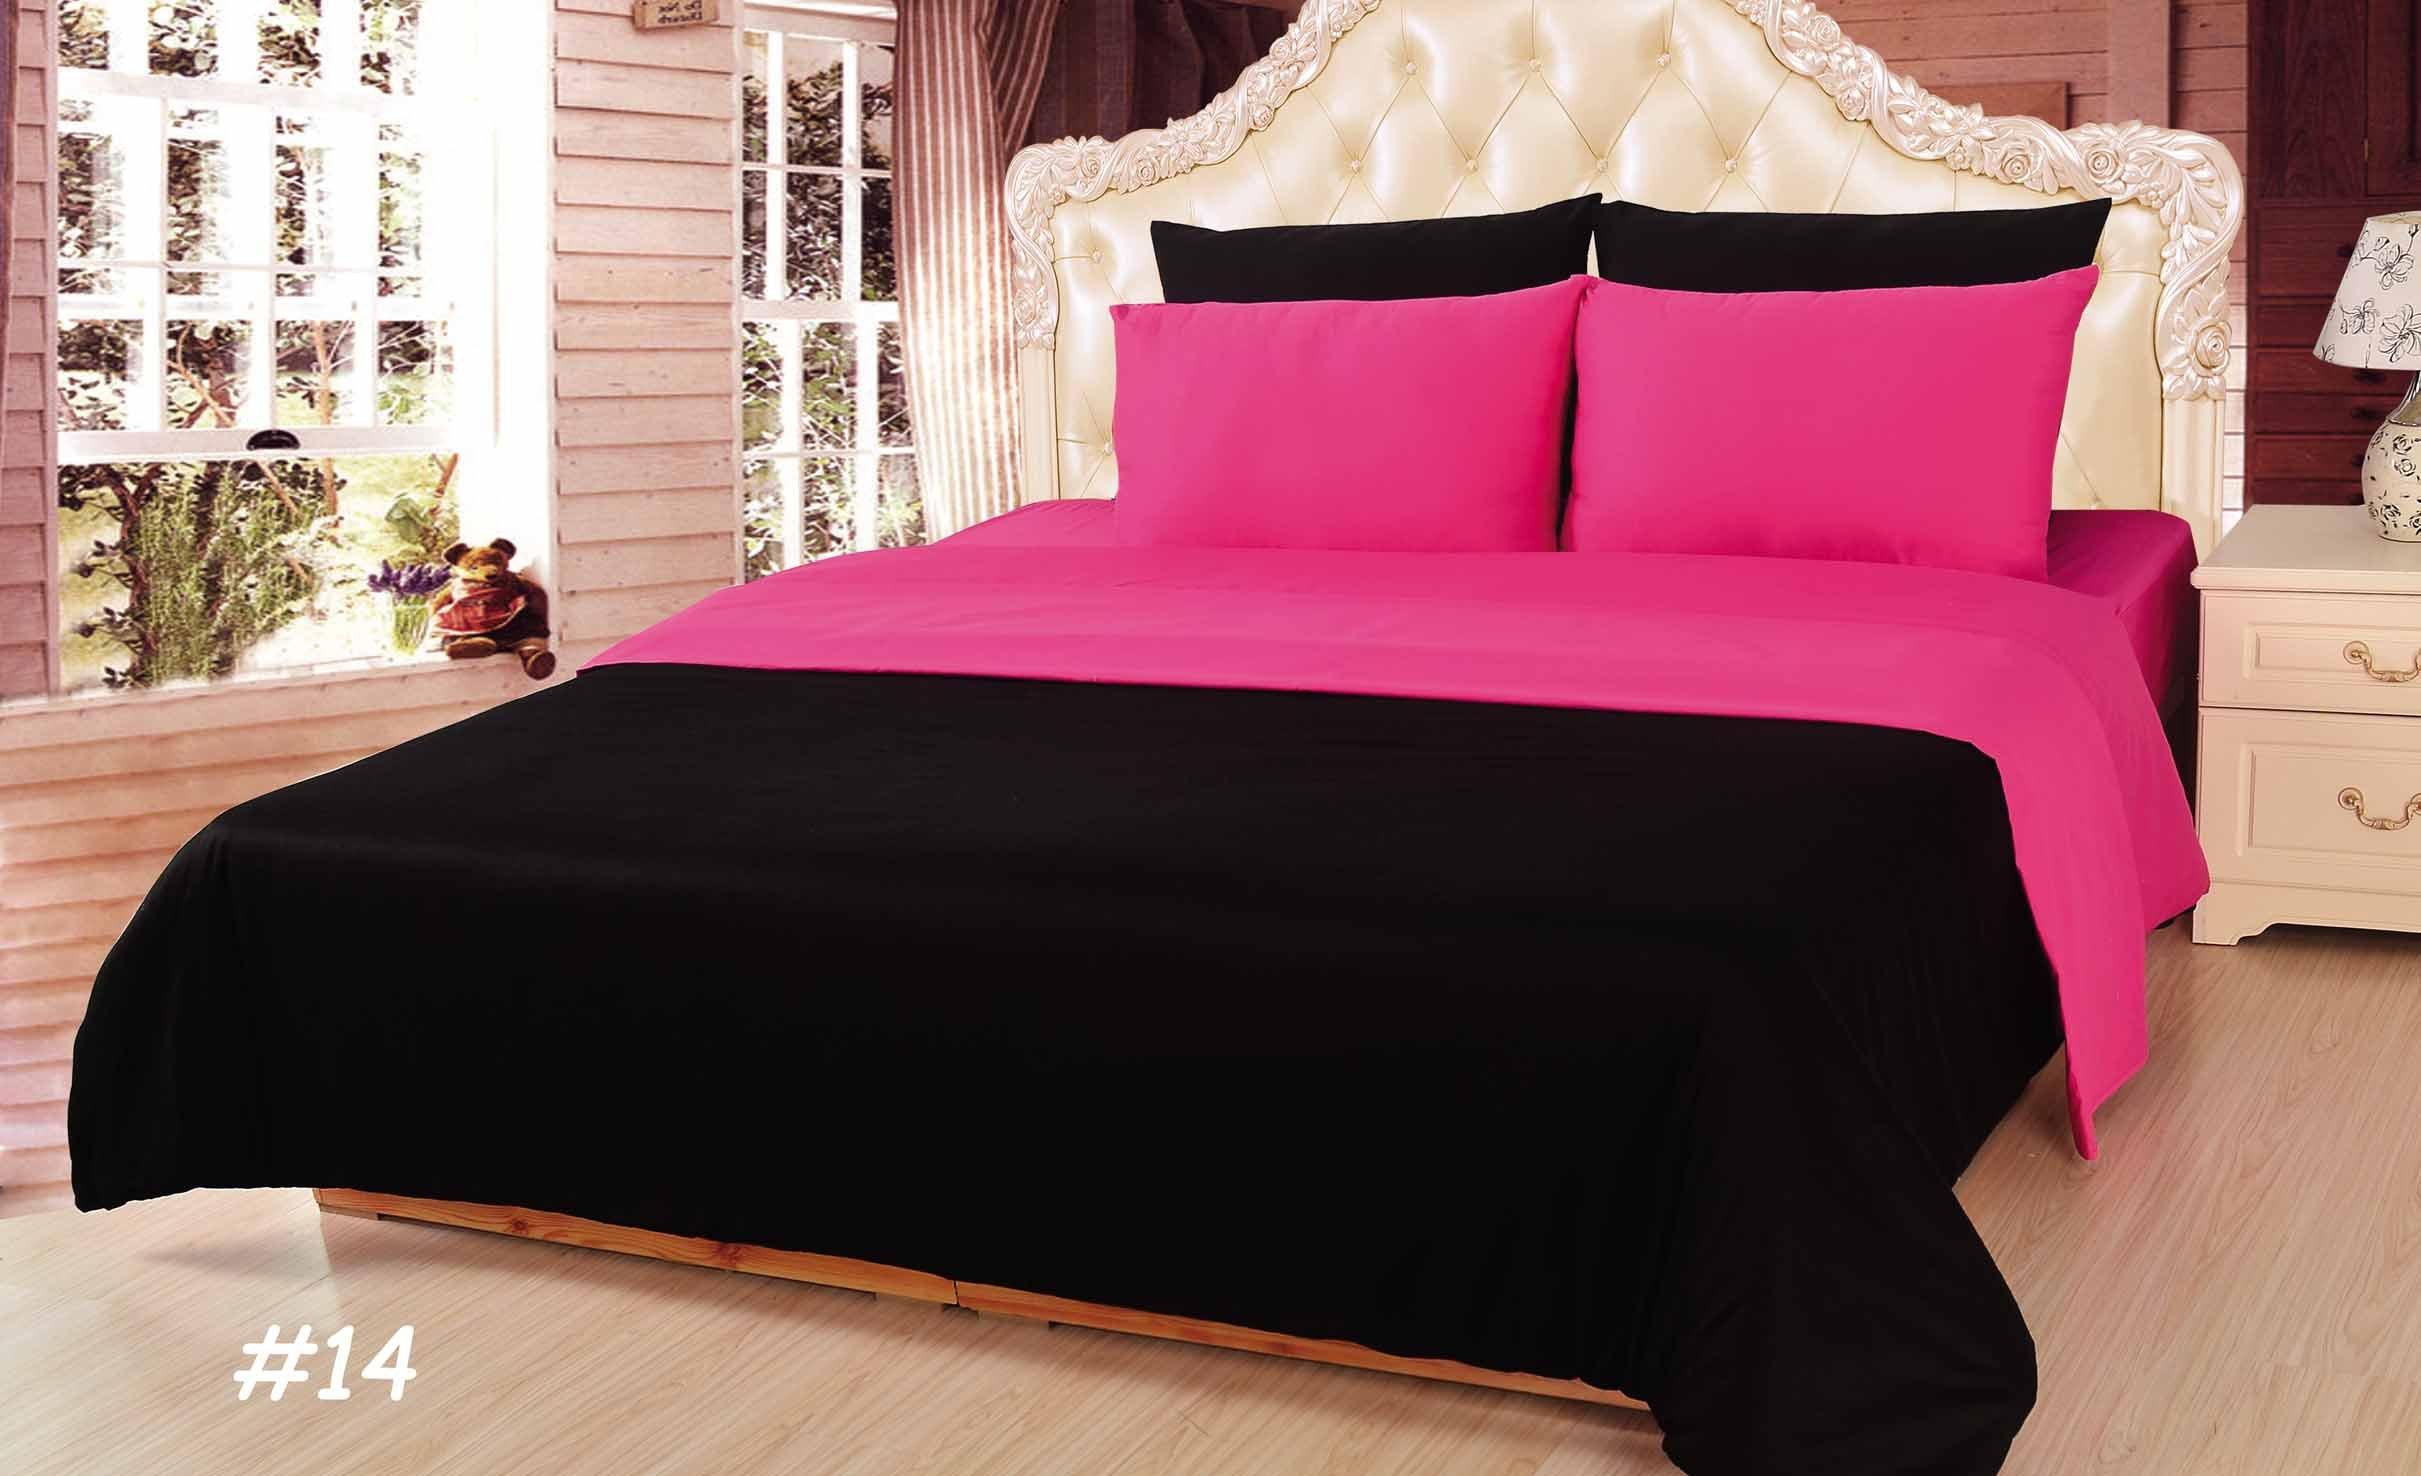 Tache Home Fashion DUALColorPink-S Reversible Comforter Set, Twin, Pink by Tache Home Fashion (Image #2)